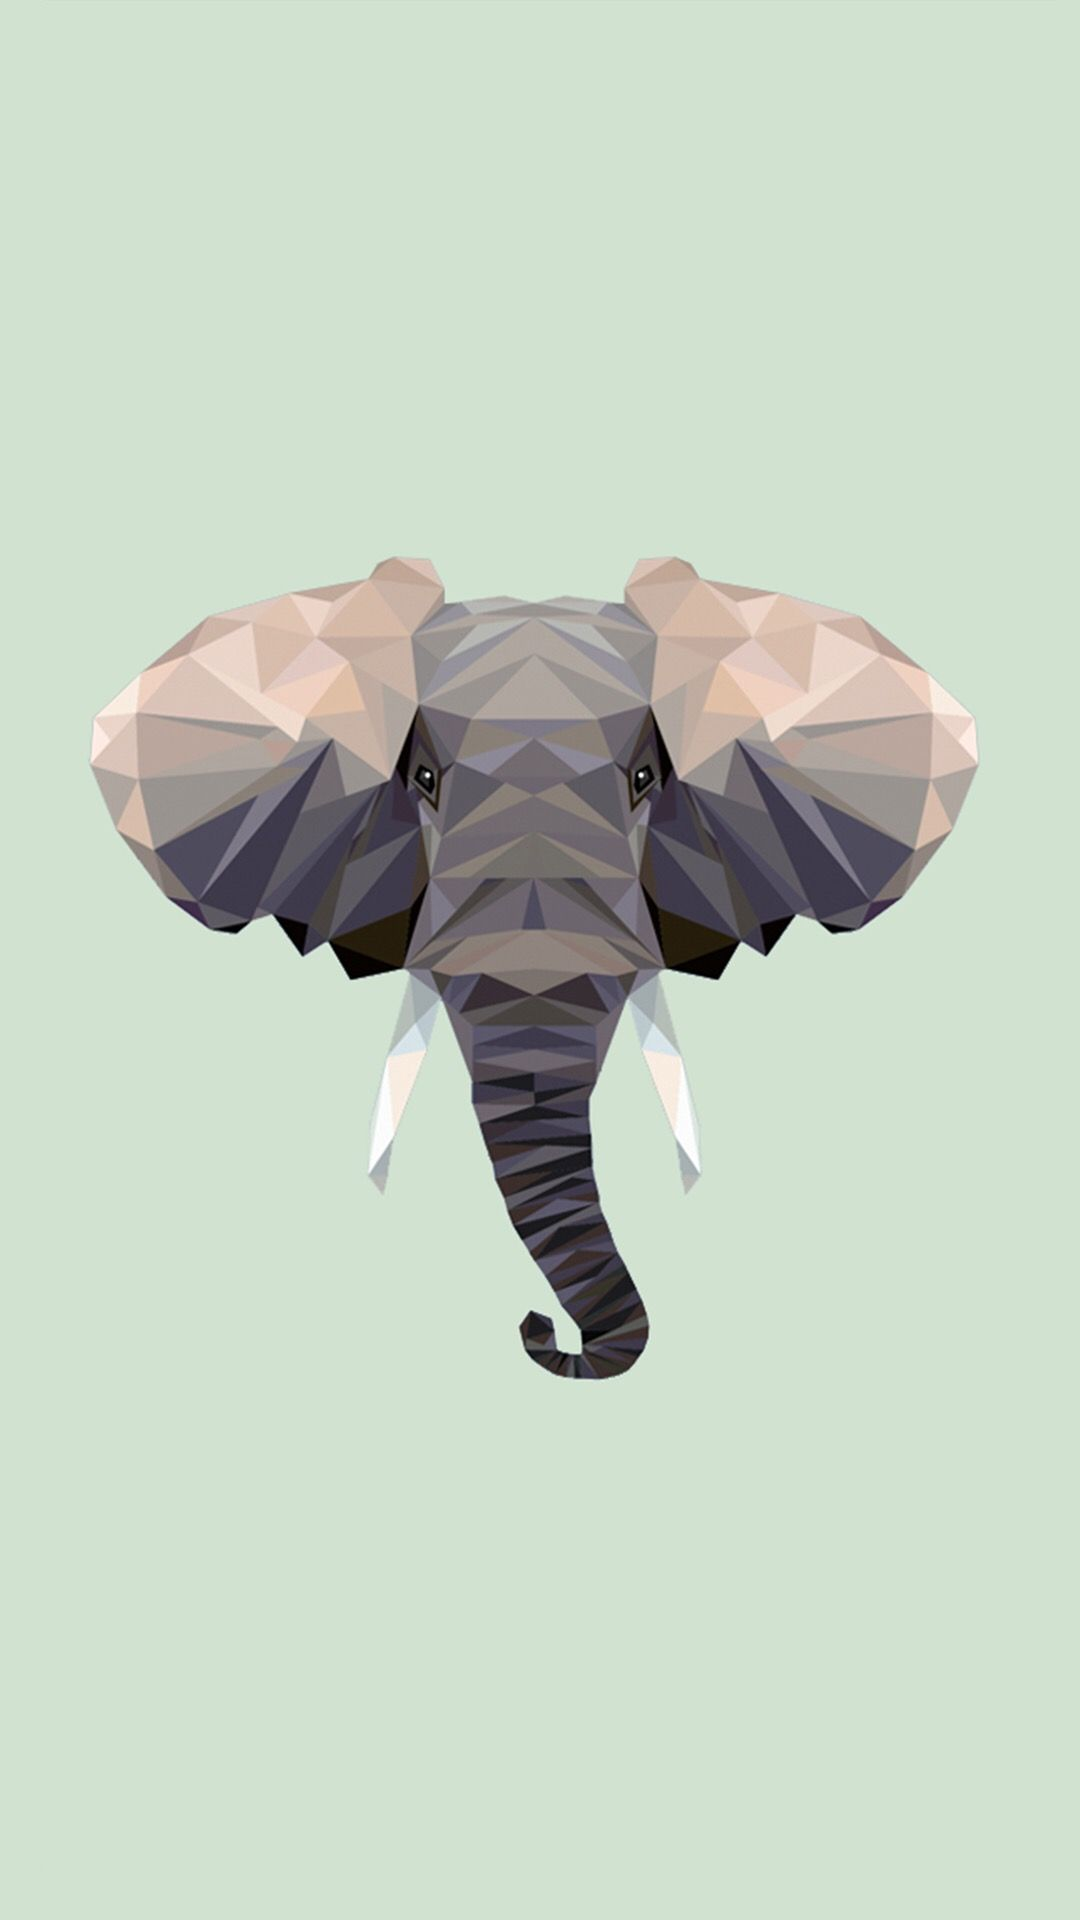 Pin De Leeghan En Iphone Wallpapers Fondo De Elefante Arte De